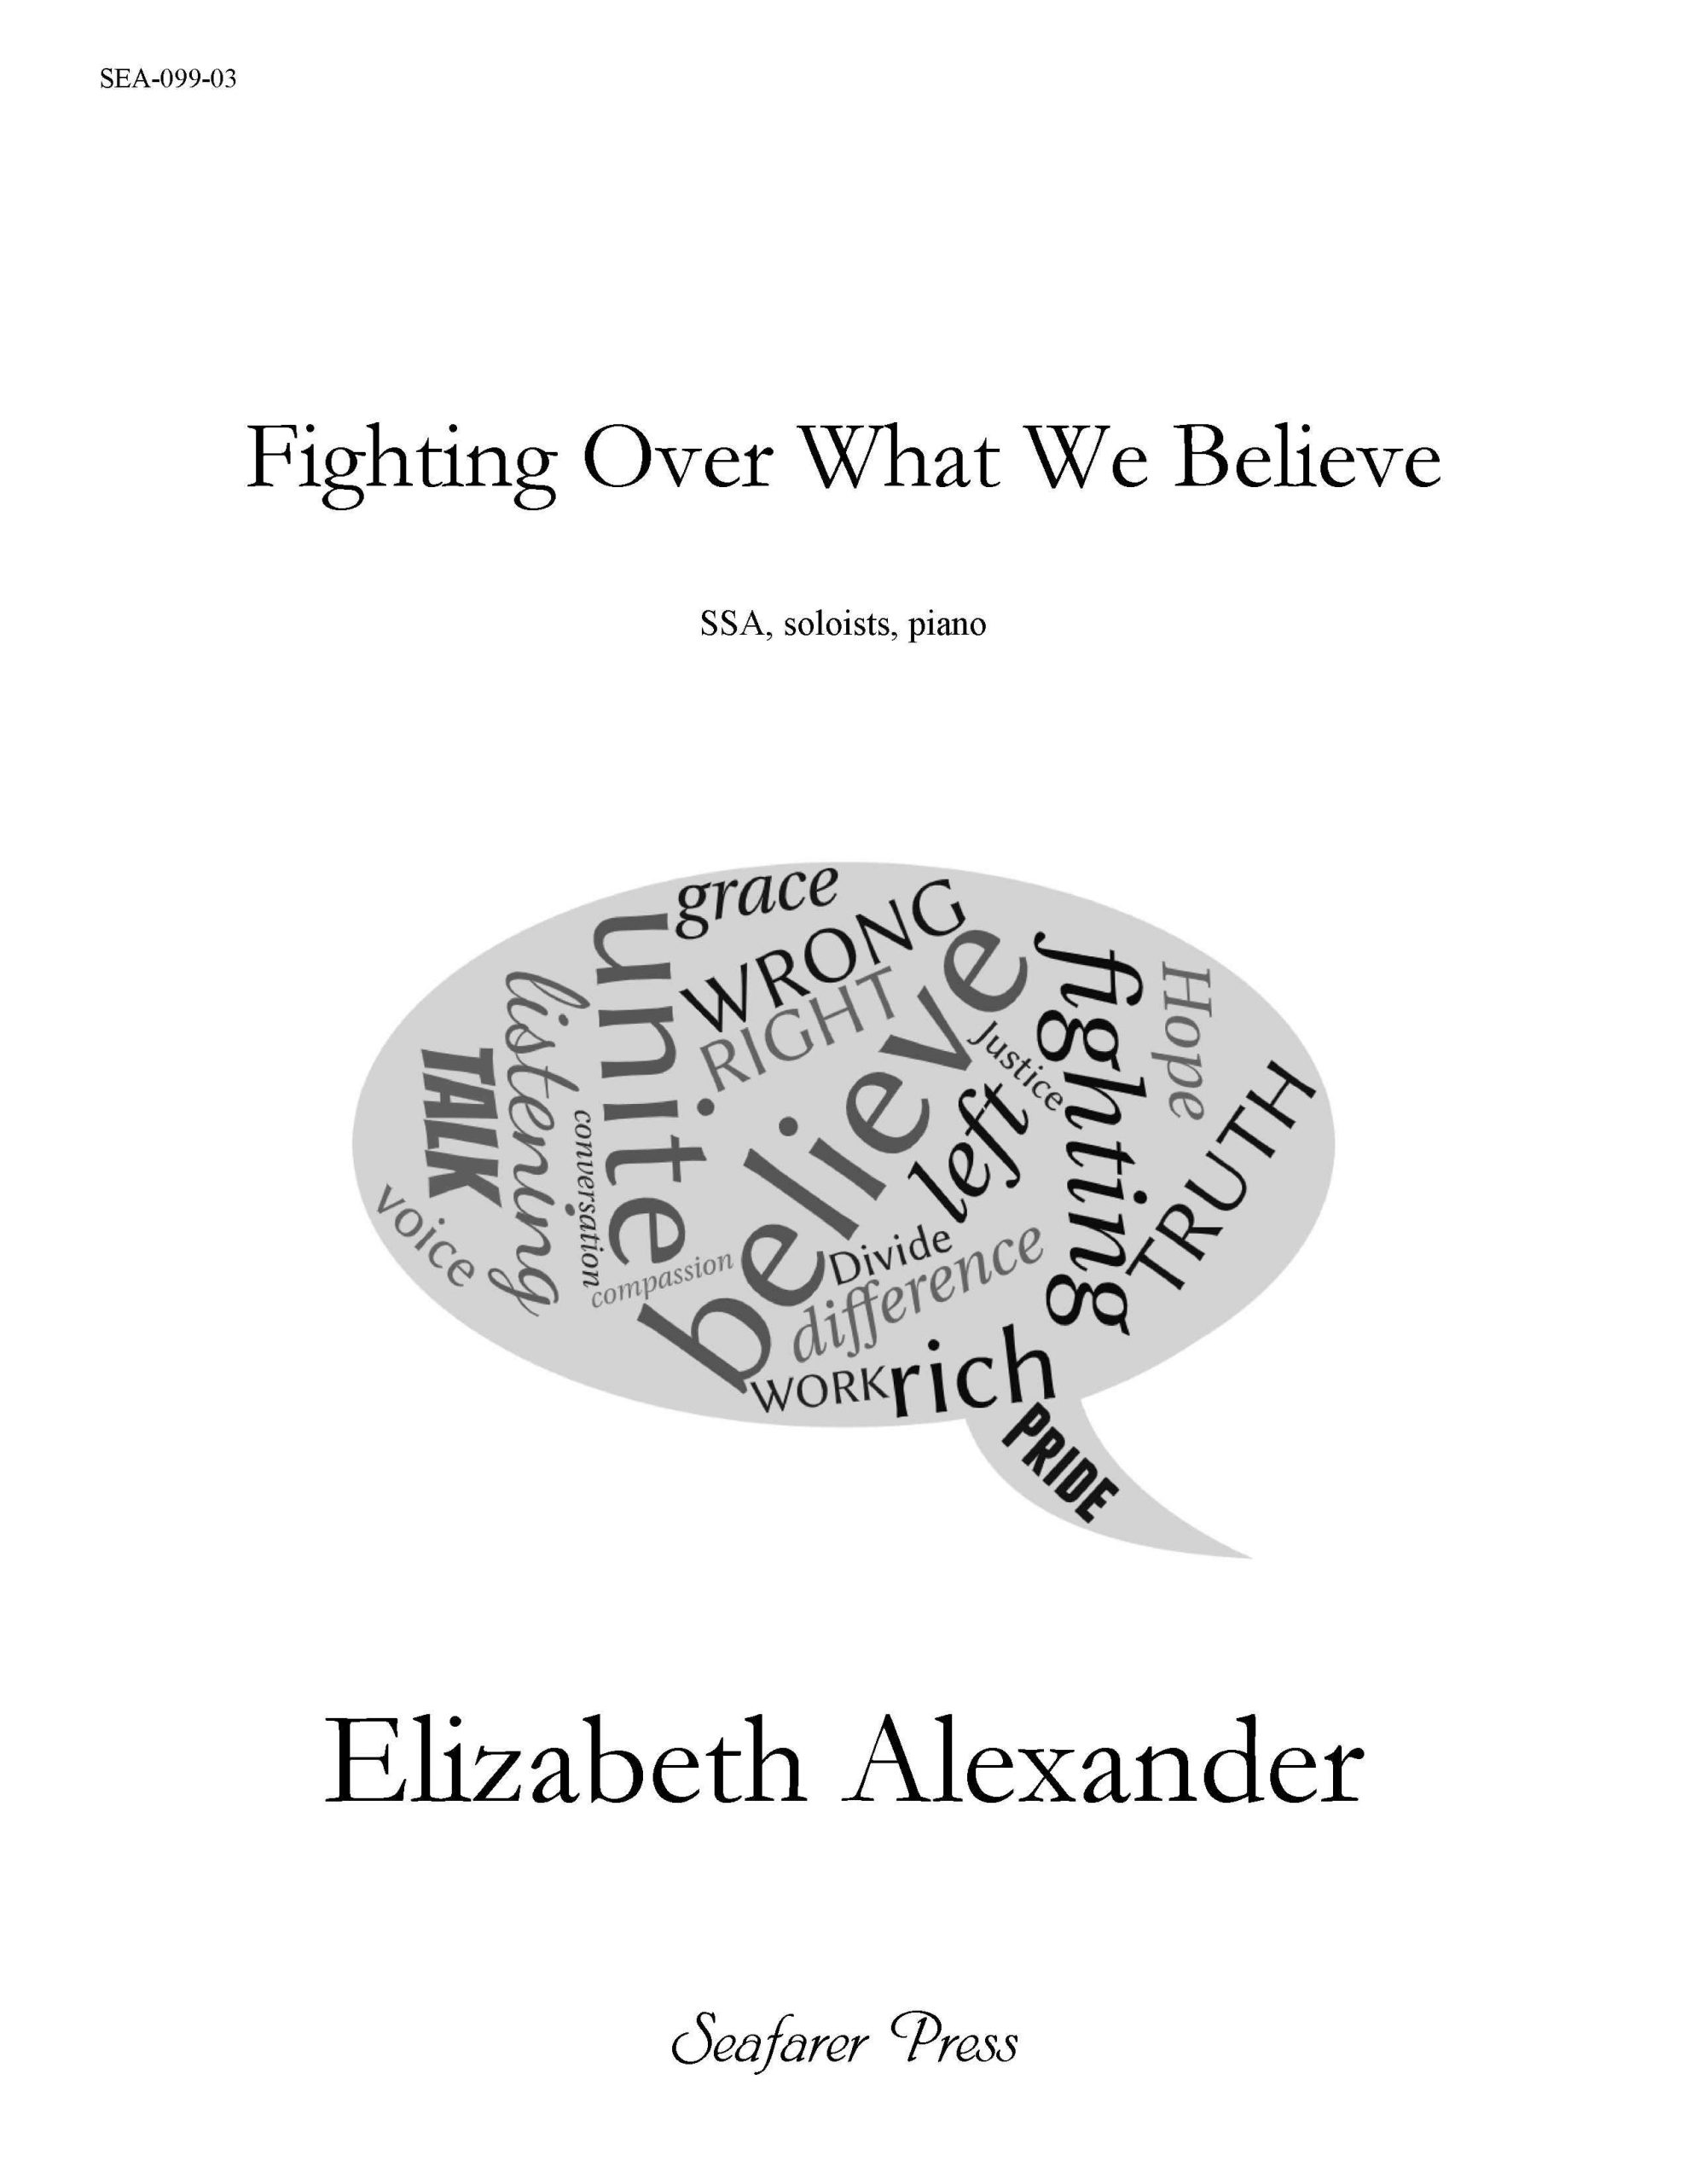 SEA-099-03 - Fighting Over What We Believe